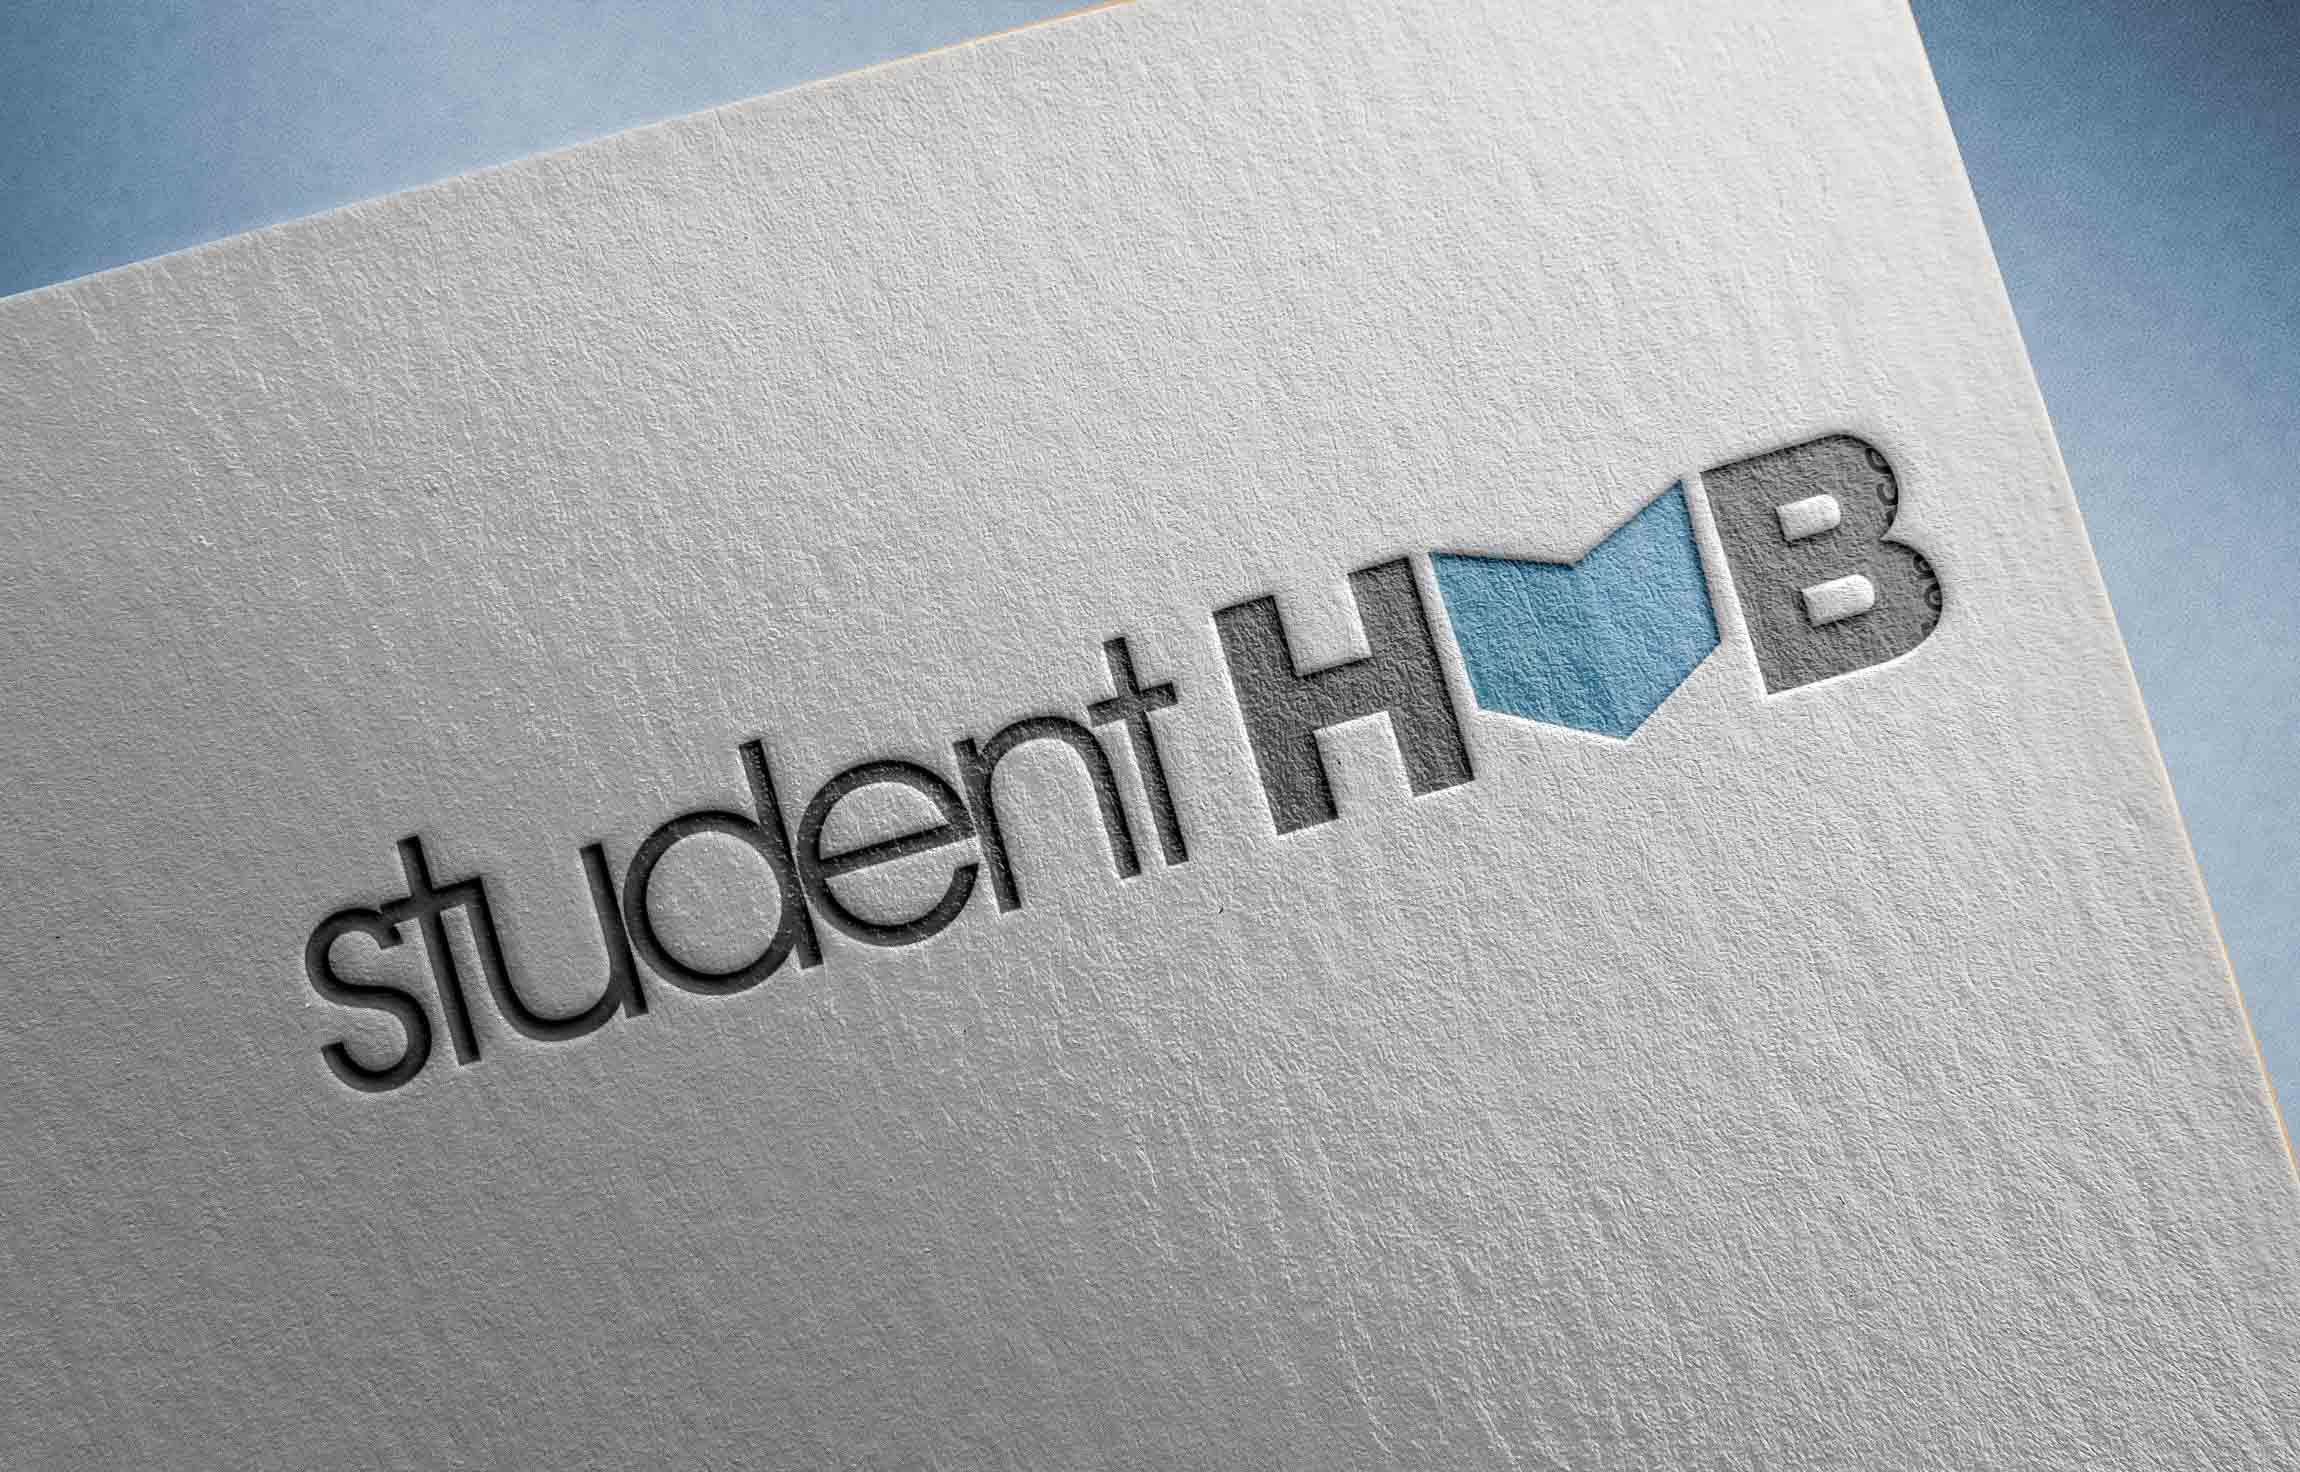 https://rdmedya.com/wp-content/uploads/2020/04/student-hub-logo1.jpg